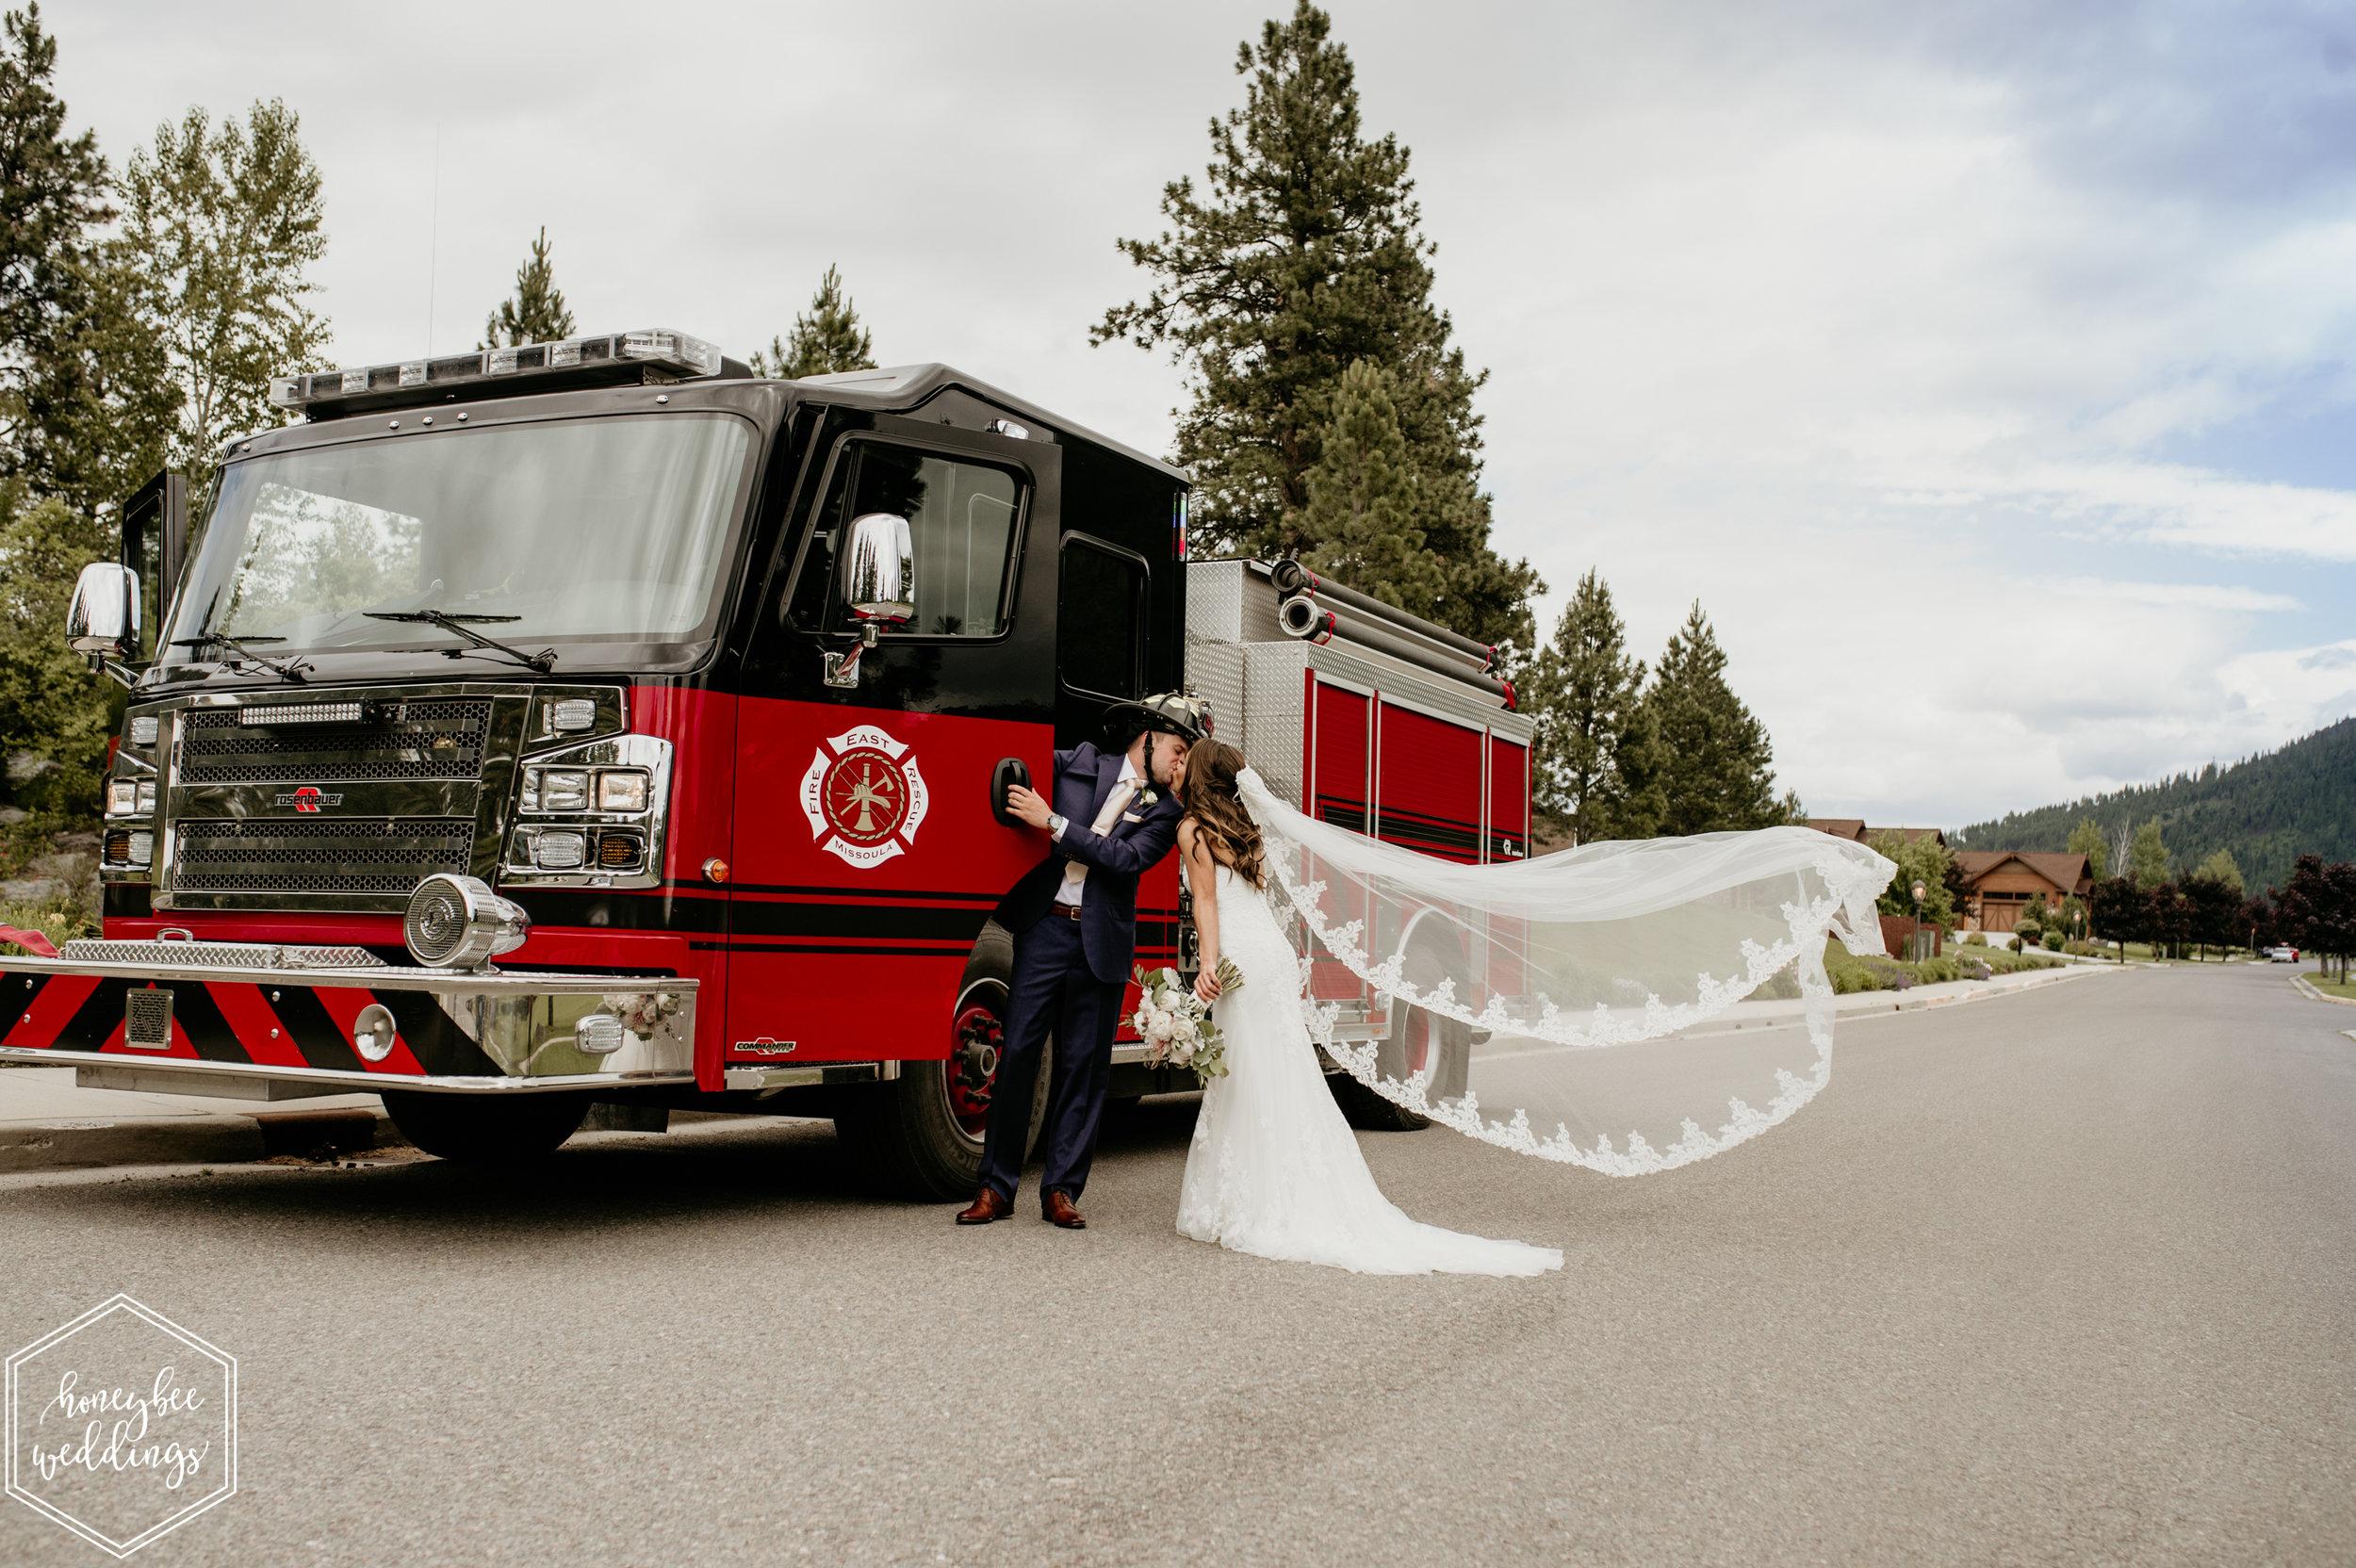 199Montana Wedding Photographer_Missoula Wedding_Honeybee Weddings_Devlin & Jacob_June 22, 2019-2786.jpg